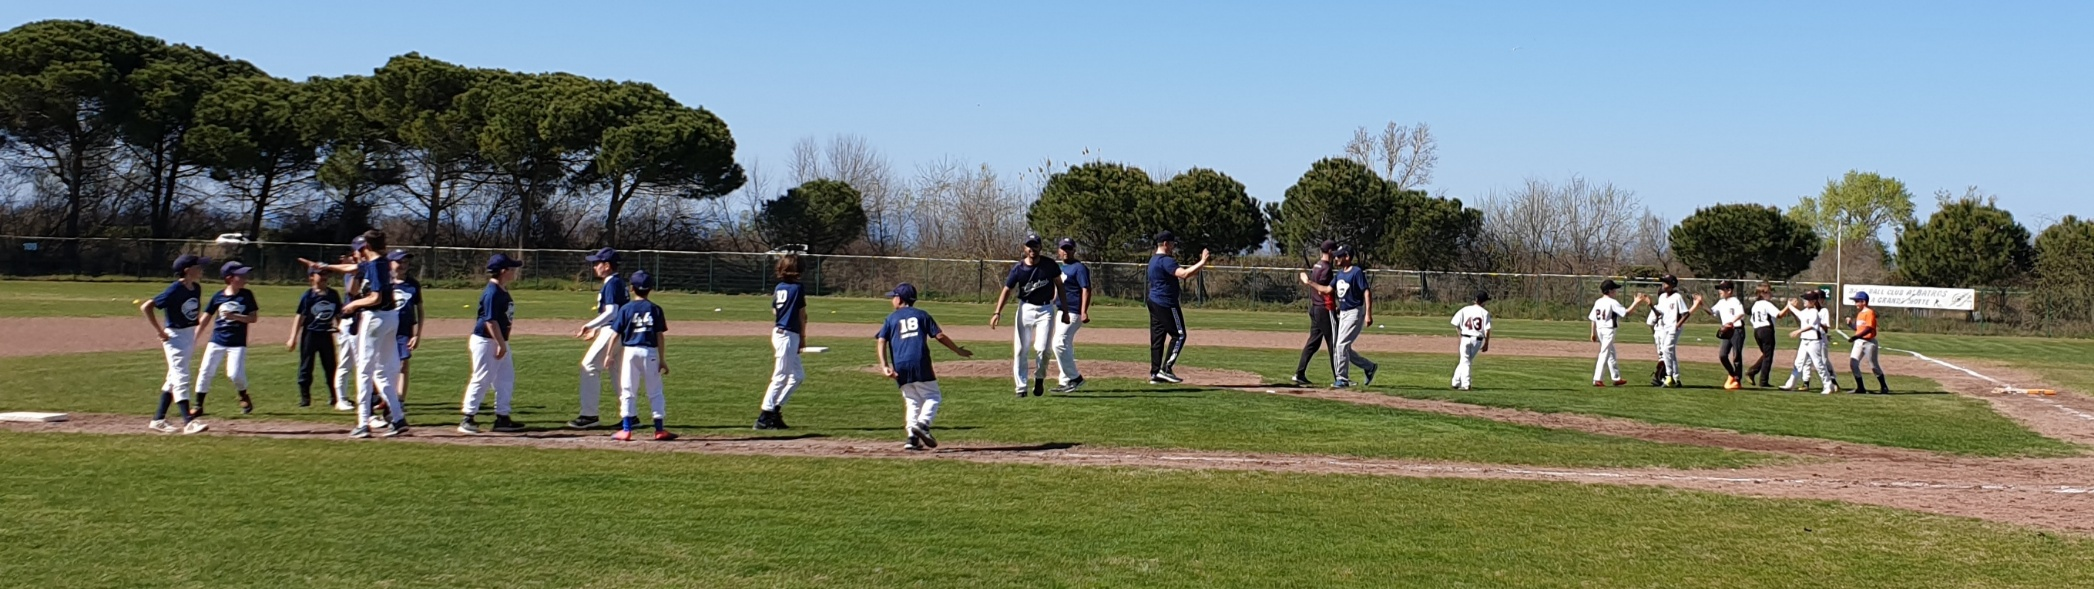 albatros-baseball-12U-23-03-19